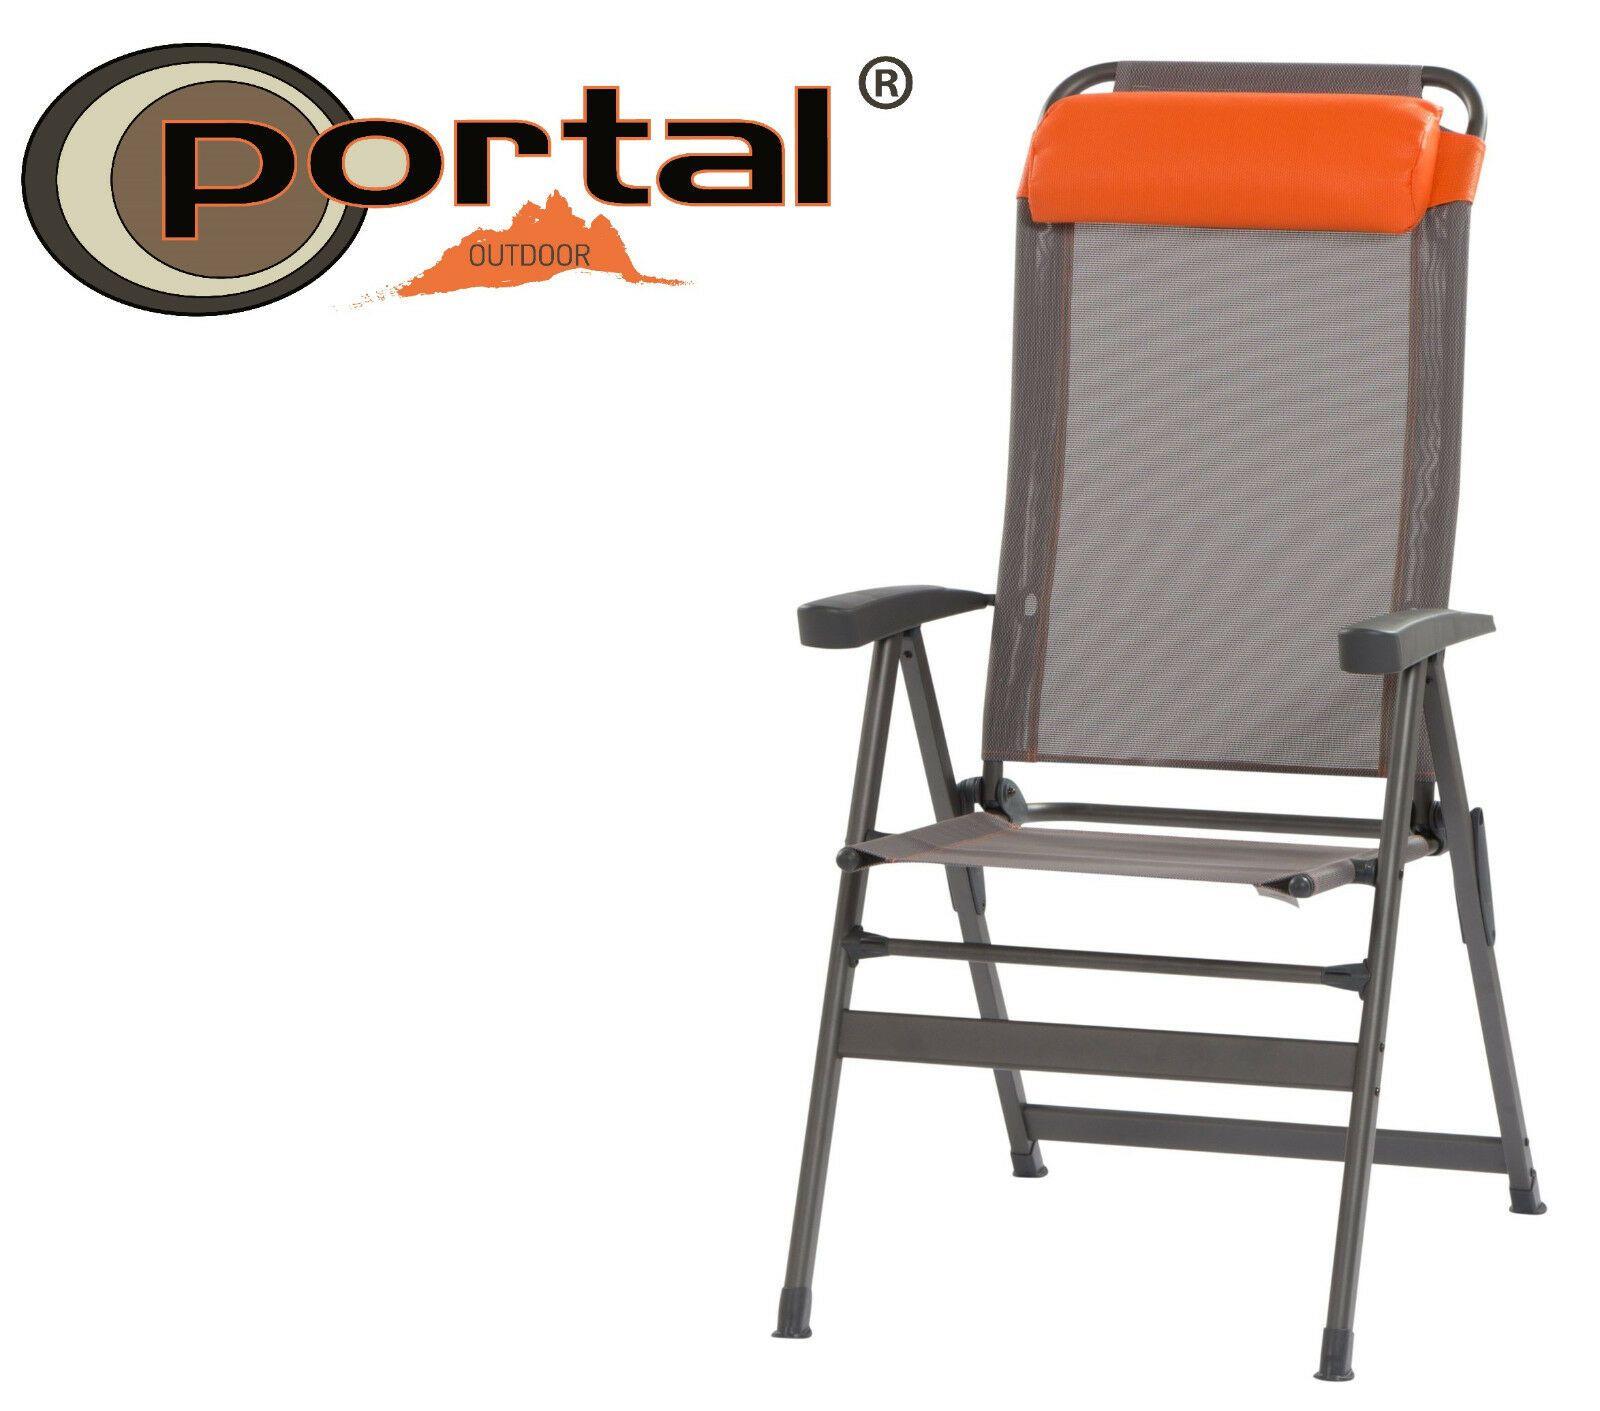 Portal Camping Klappstuhl Ken Gartenstuhl Klappsessel S Portal